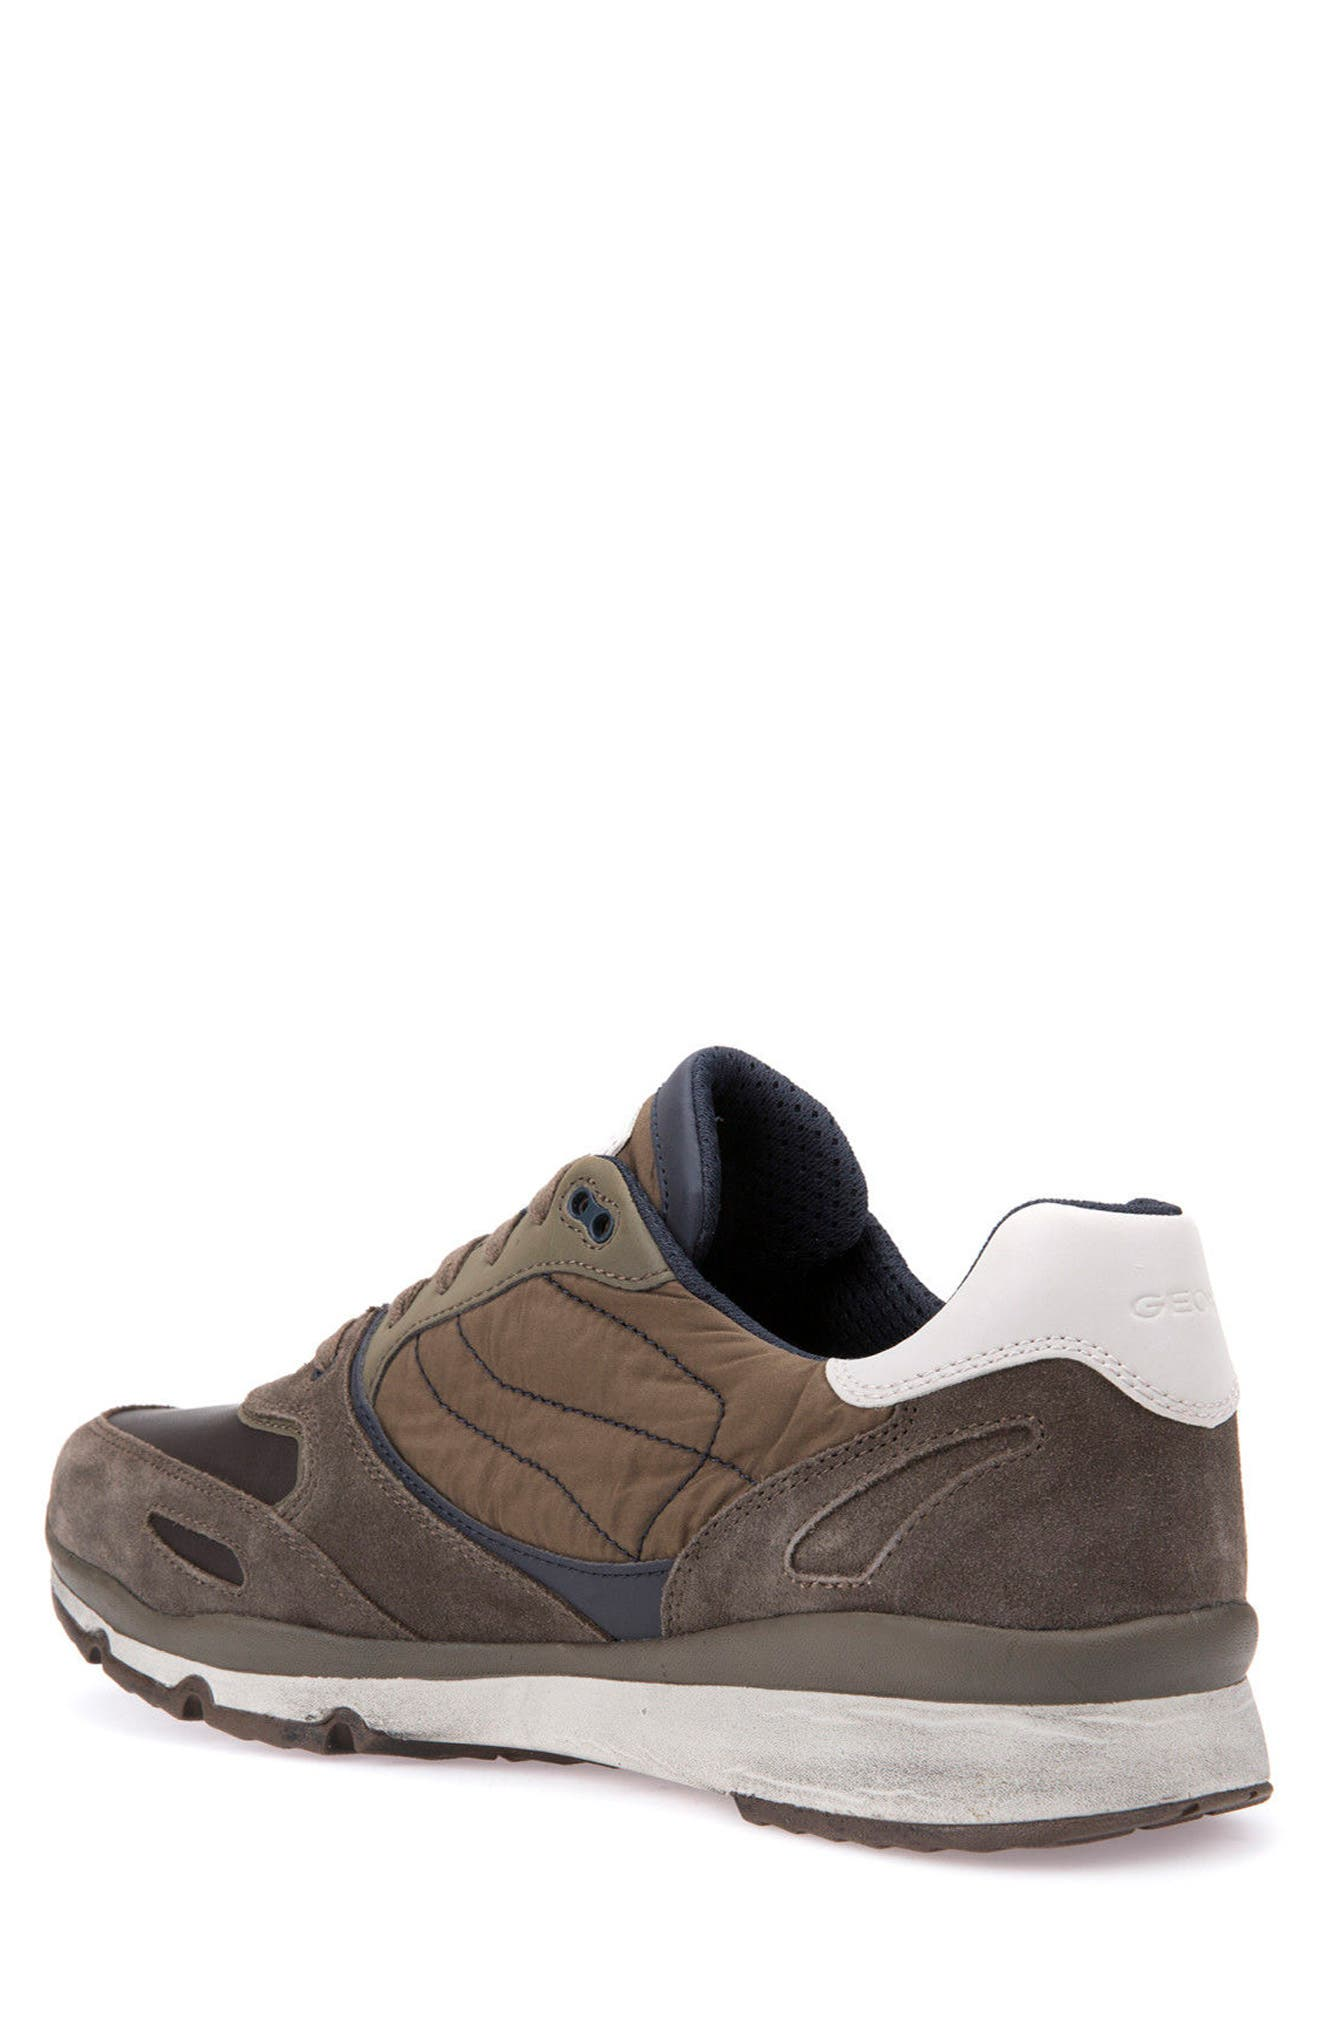 Sandro ABX Ambphibiox Waterproof Sneaker,                             Alternate thumbnail 2, color,                             Taupe